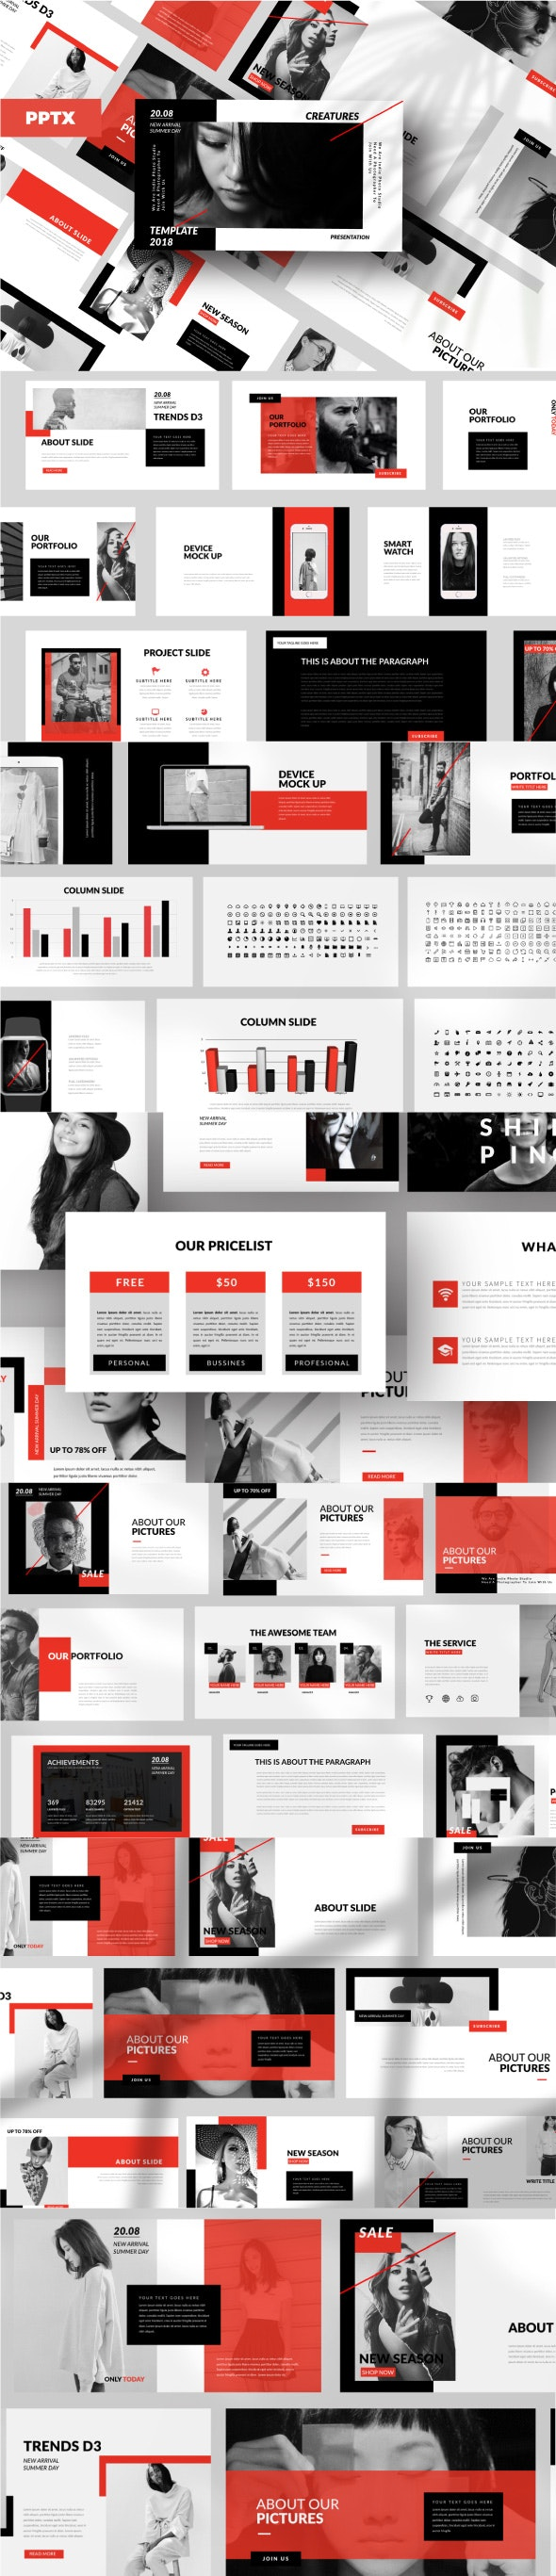 Stuff Business Powerpoint Template - Business PowerPoint Templates